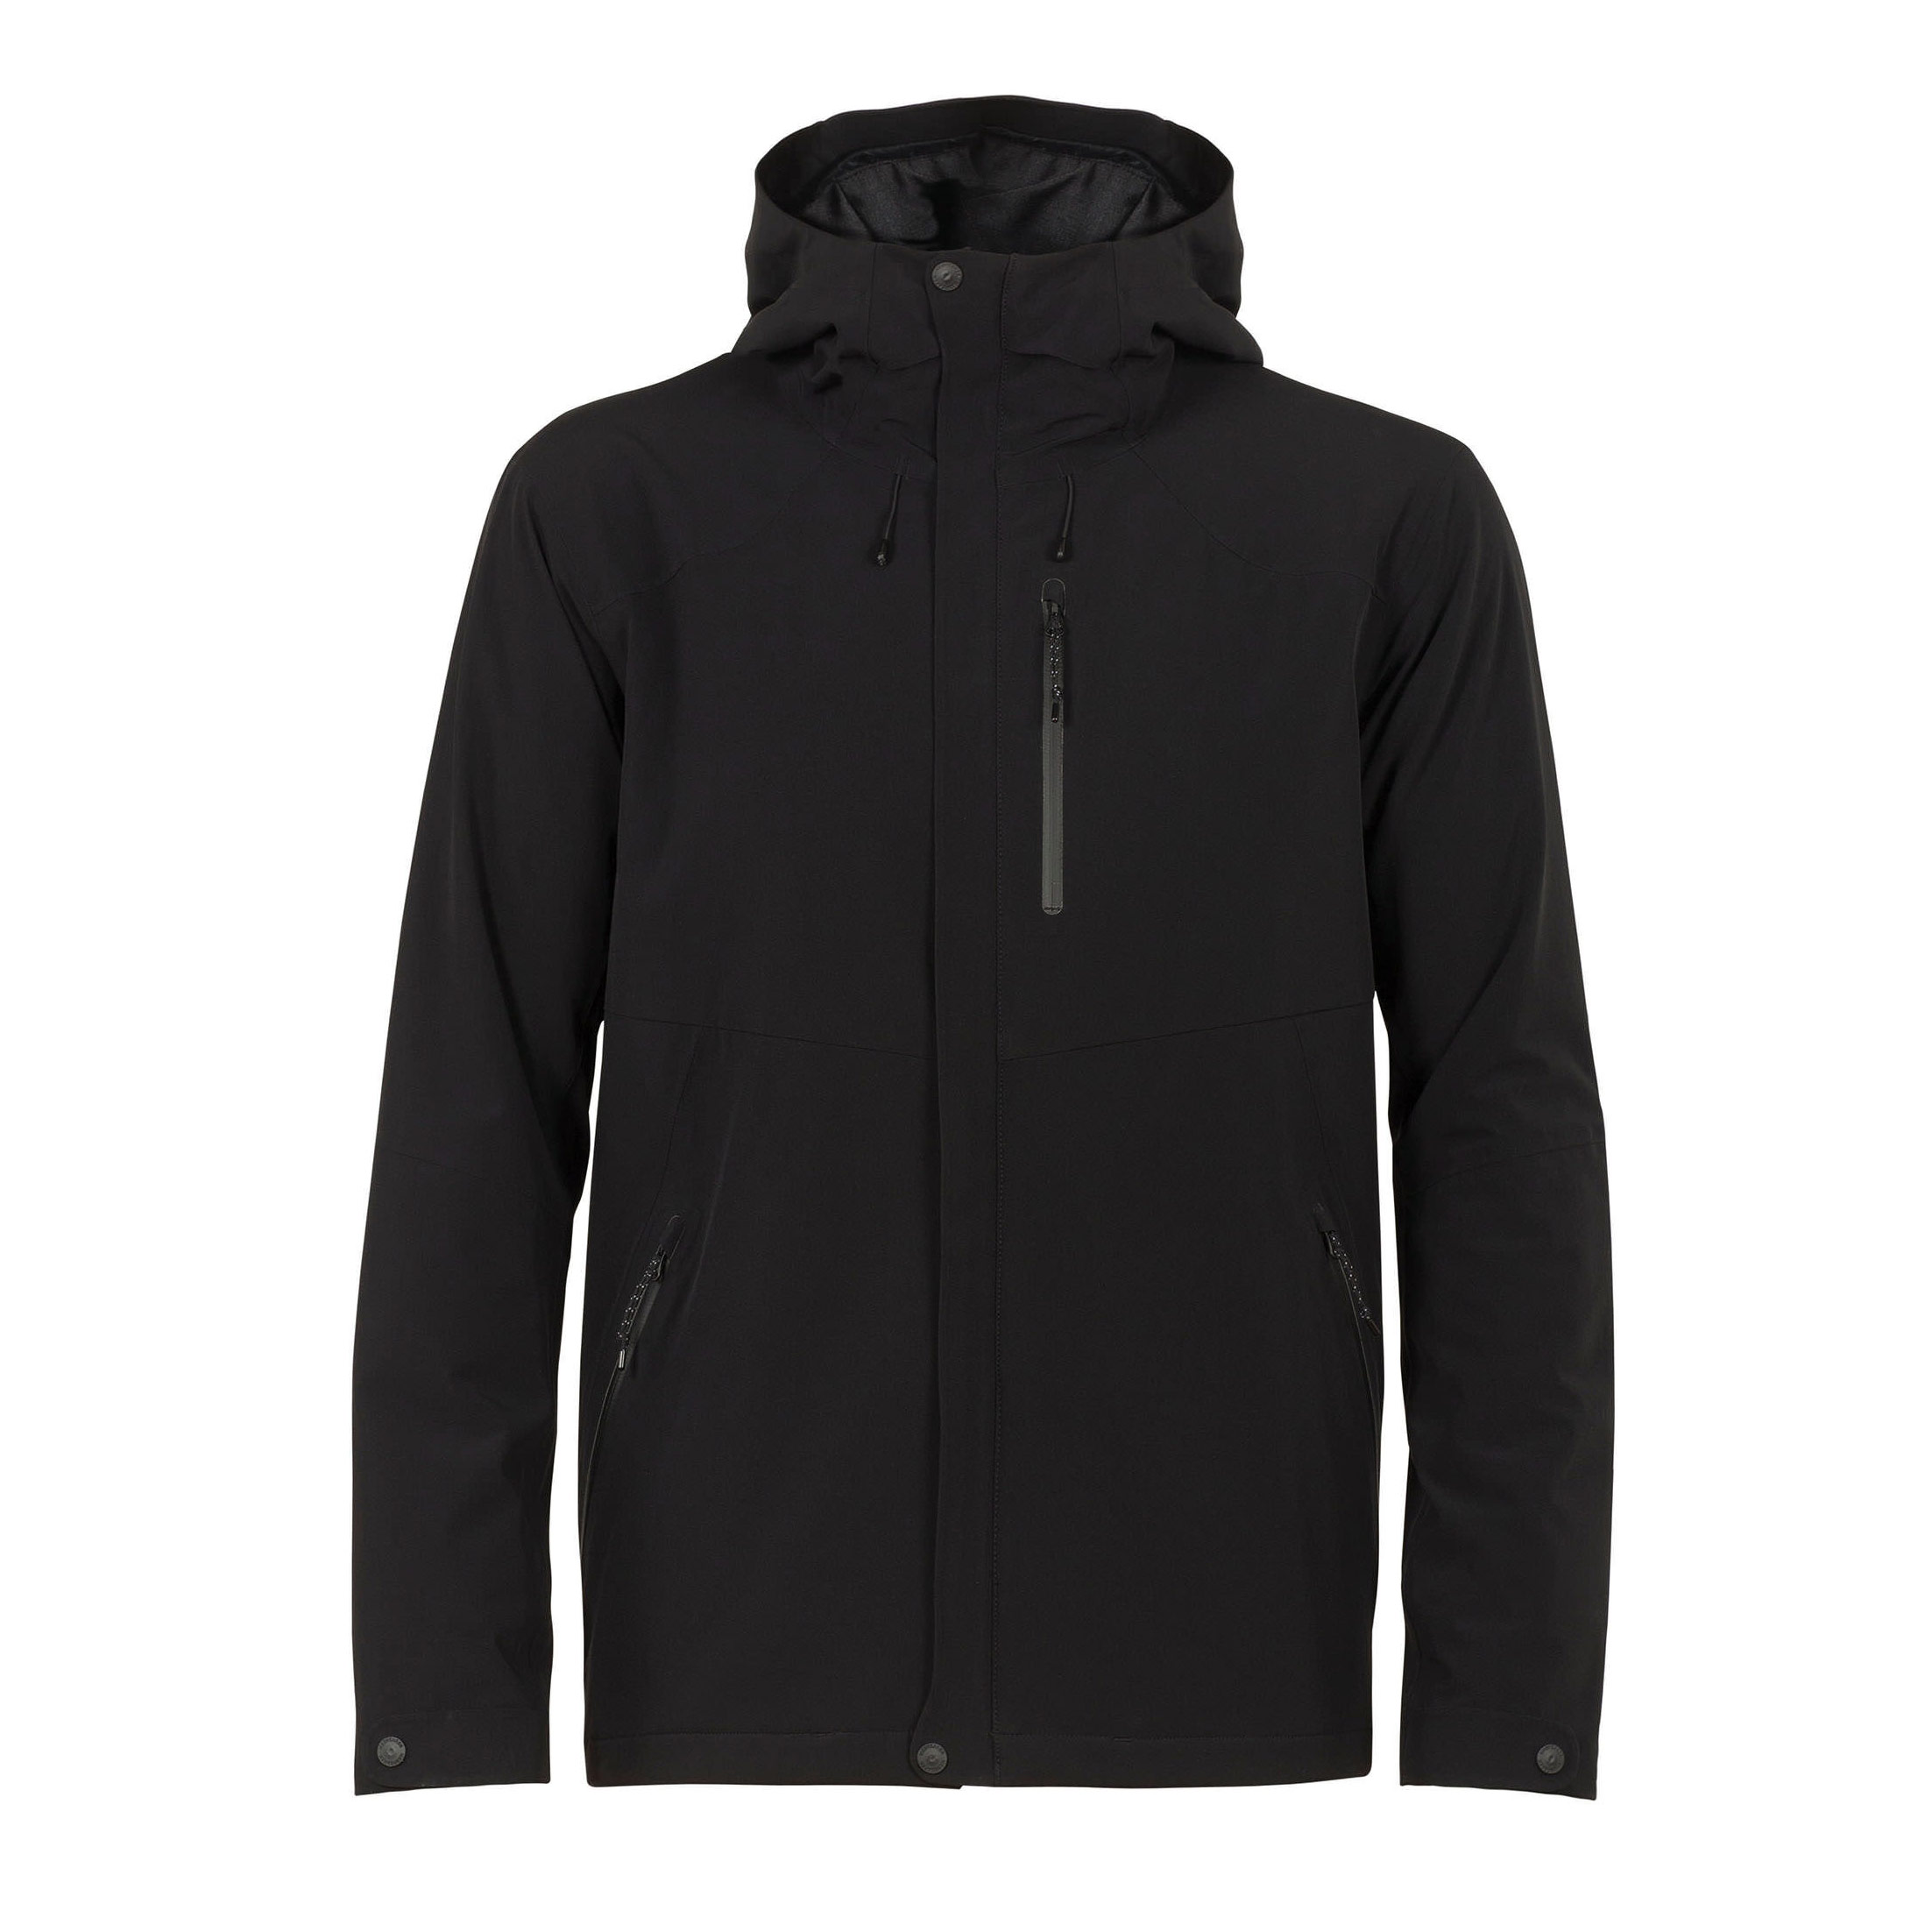 Stratus Transcend Hooded Jacket - Men's